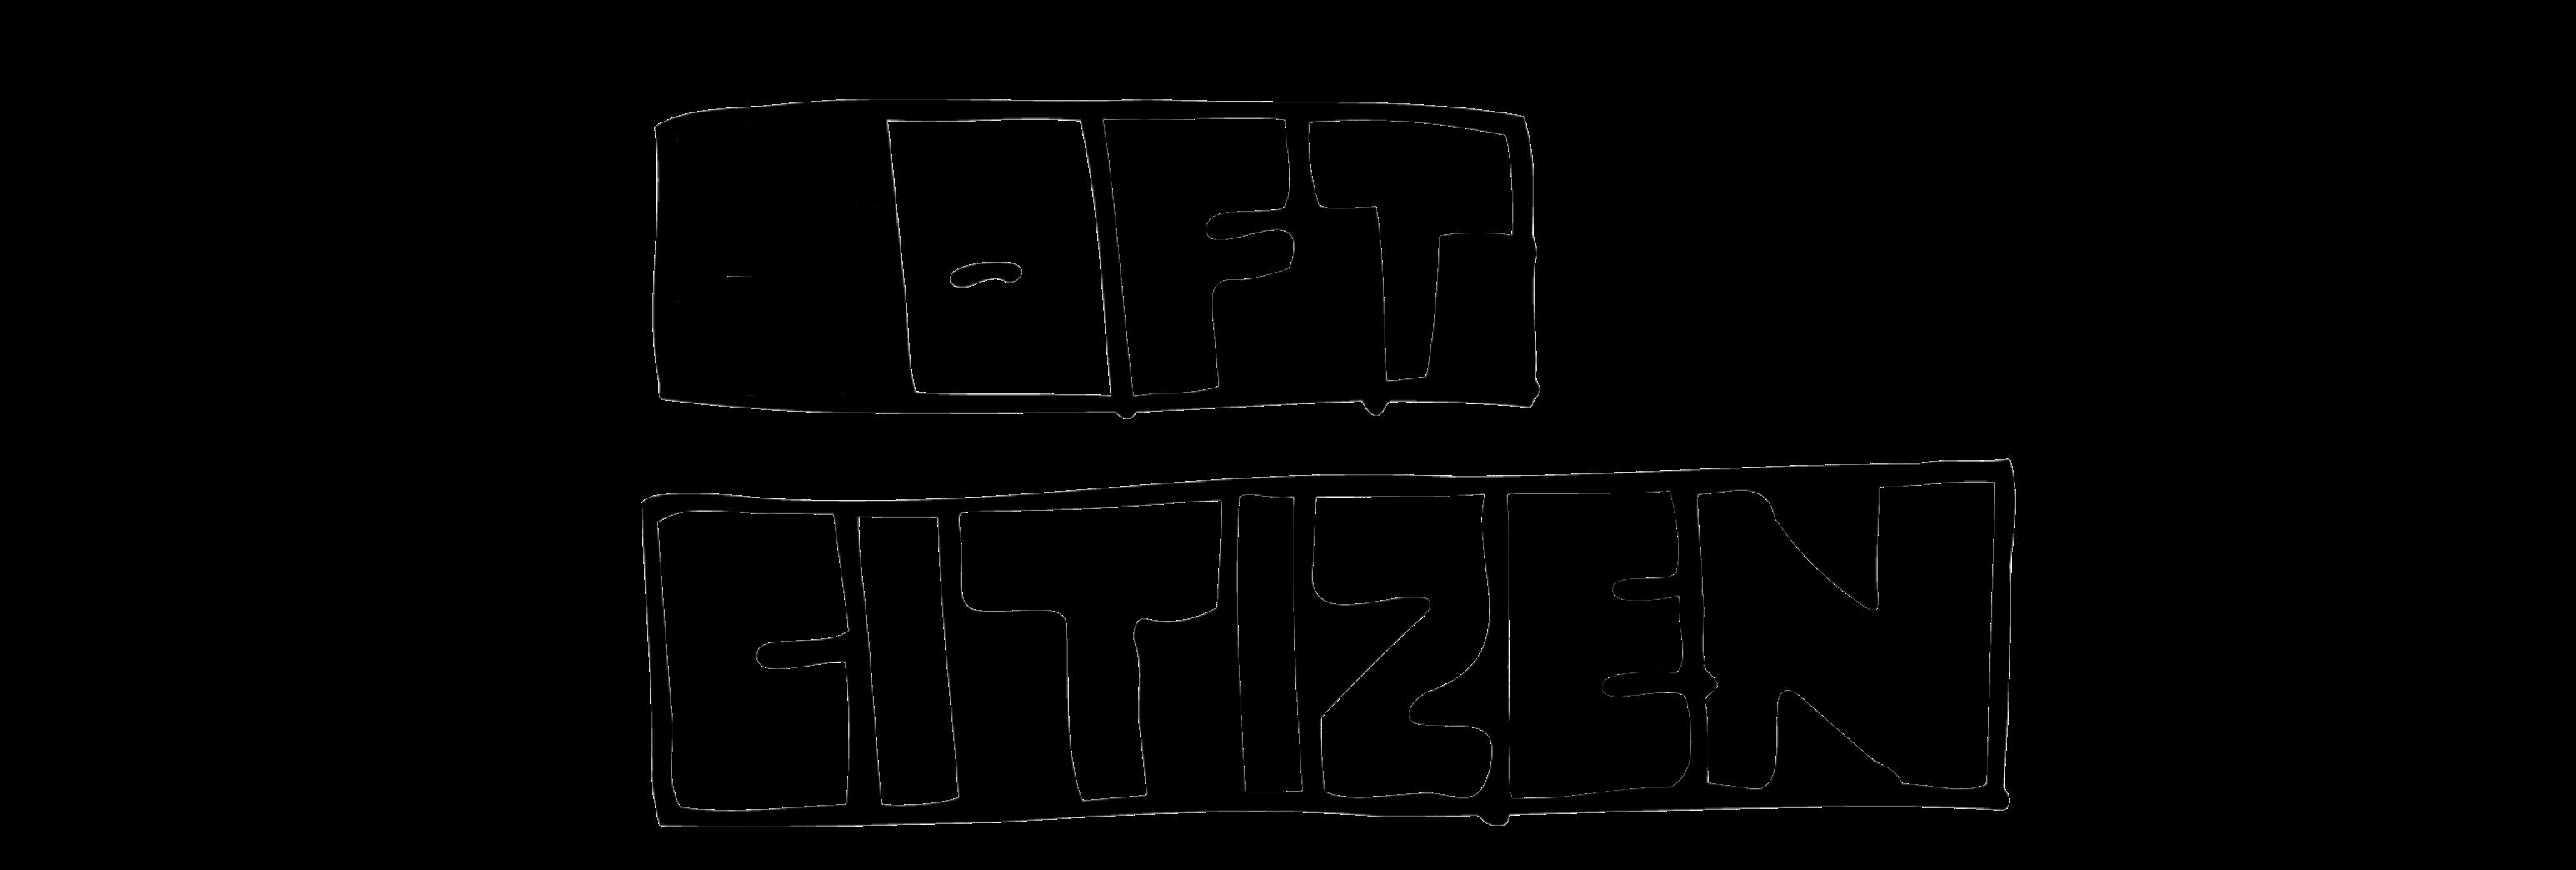 representation3